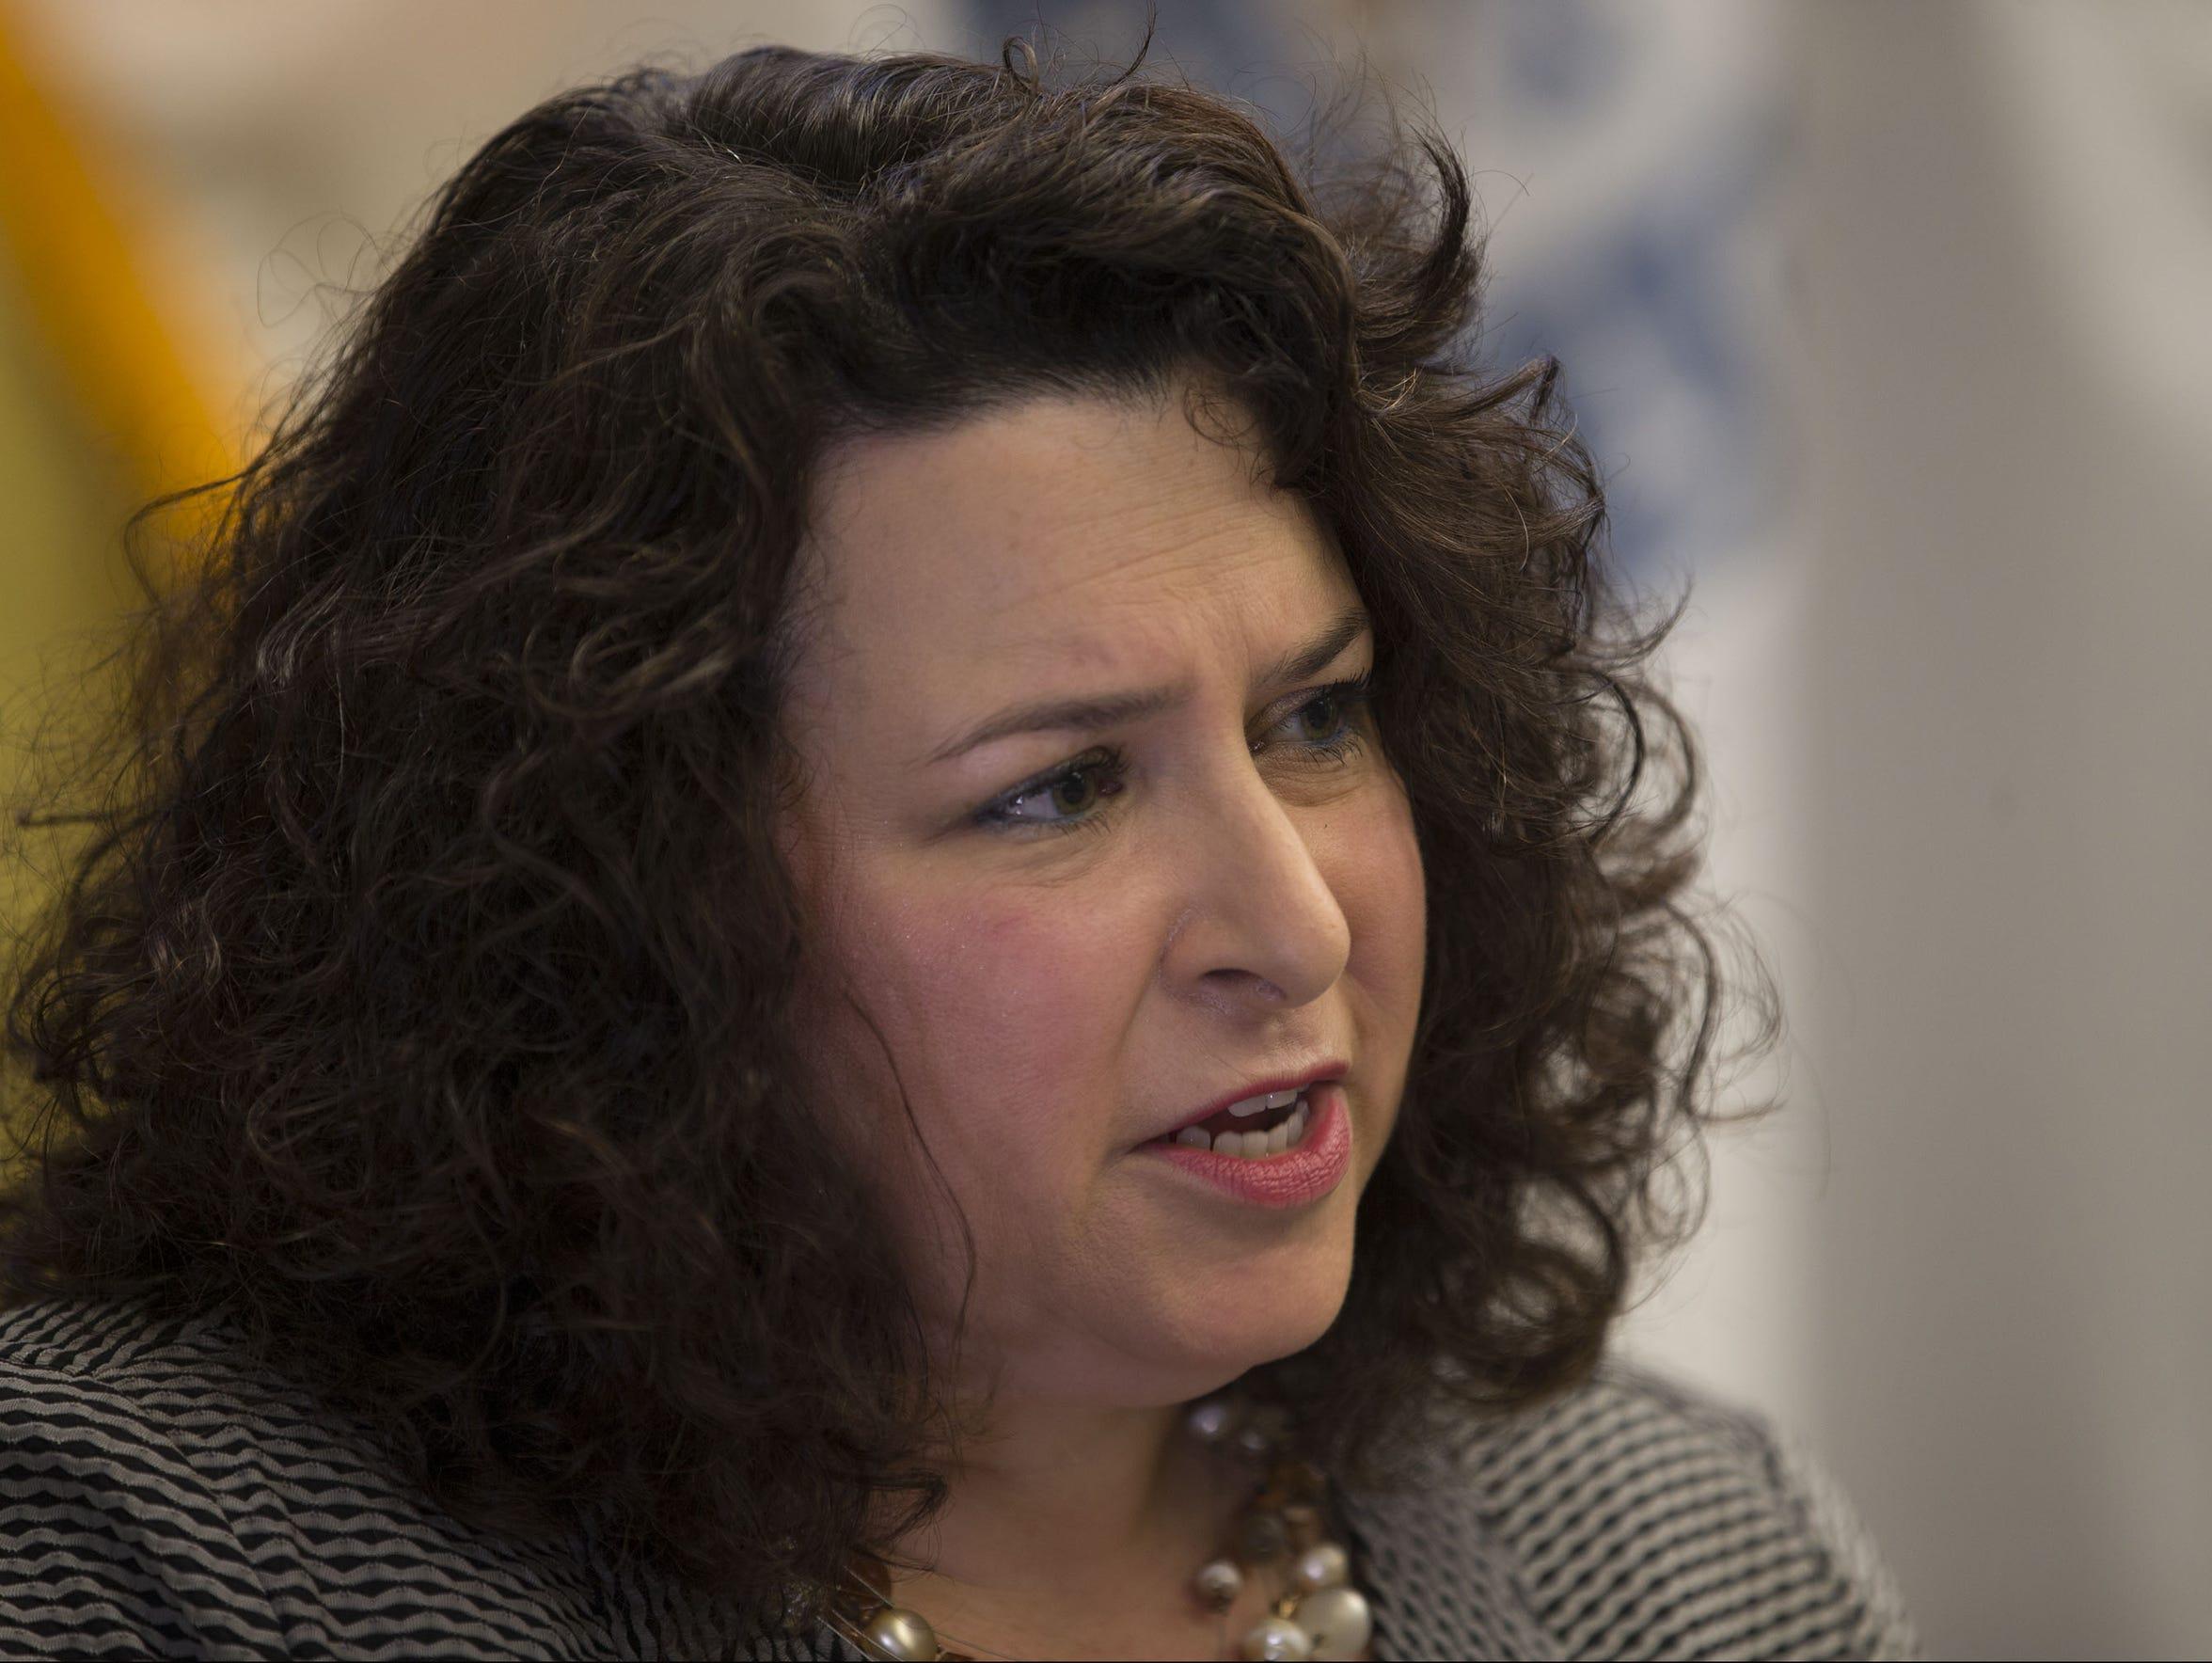 First Assistant Prosecutor Lori Linsky